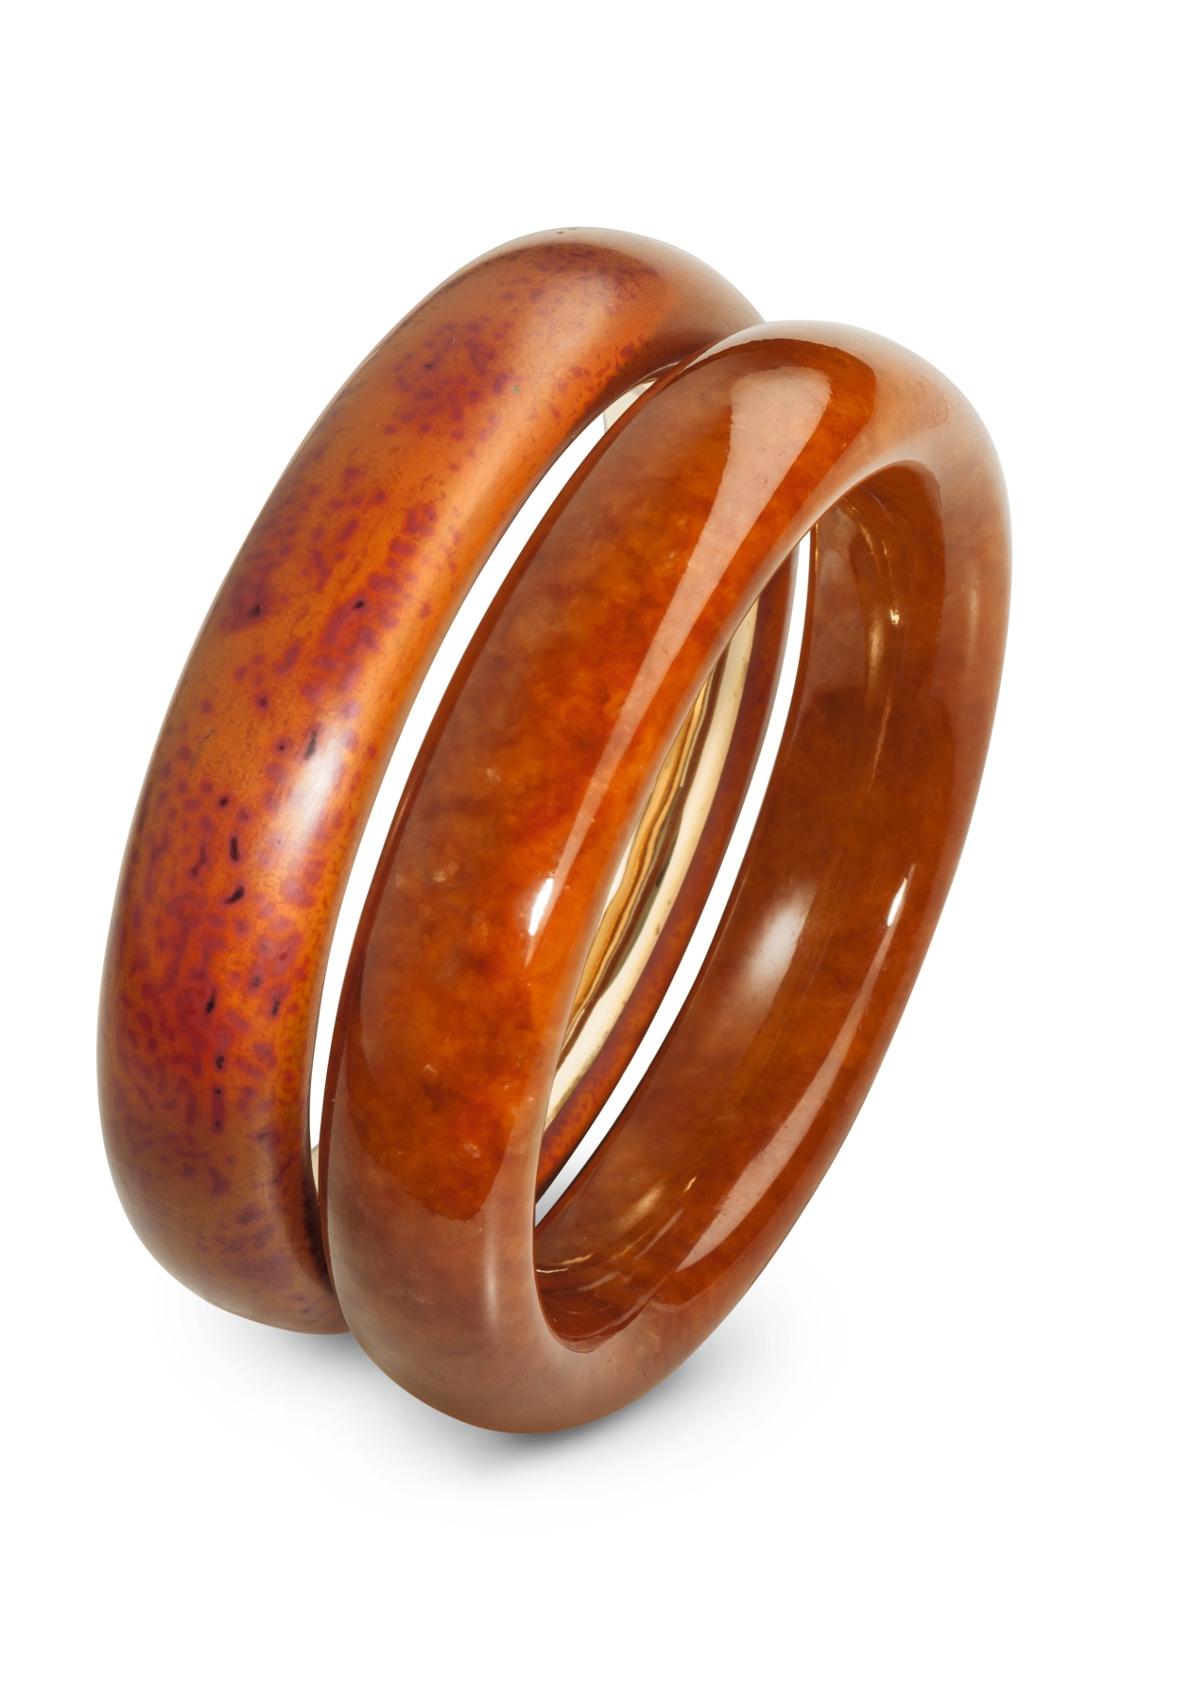 hemmerle-bangles-jade-copper-gold-0691-14_copy